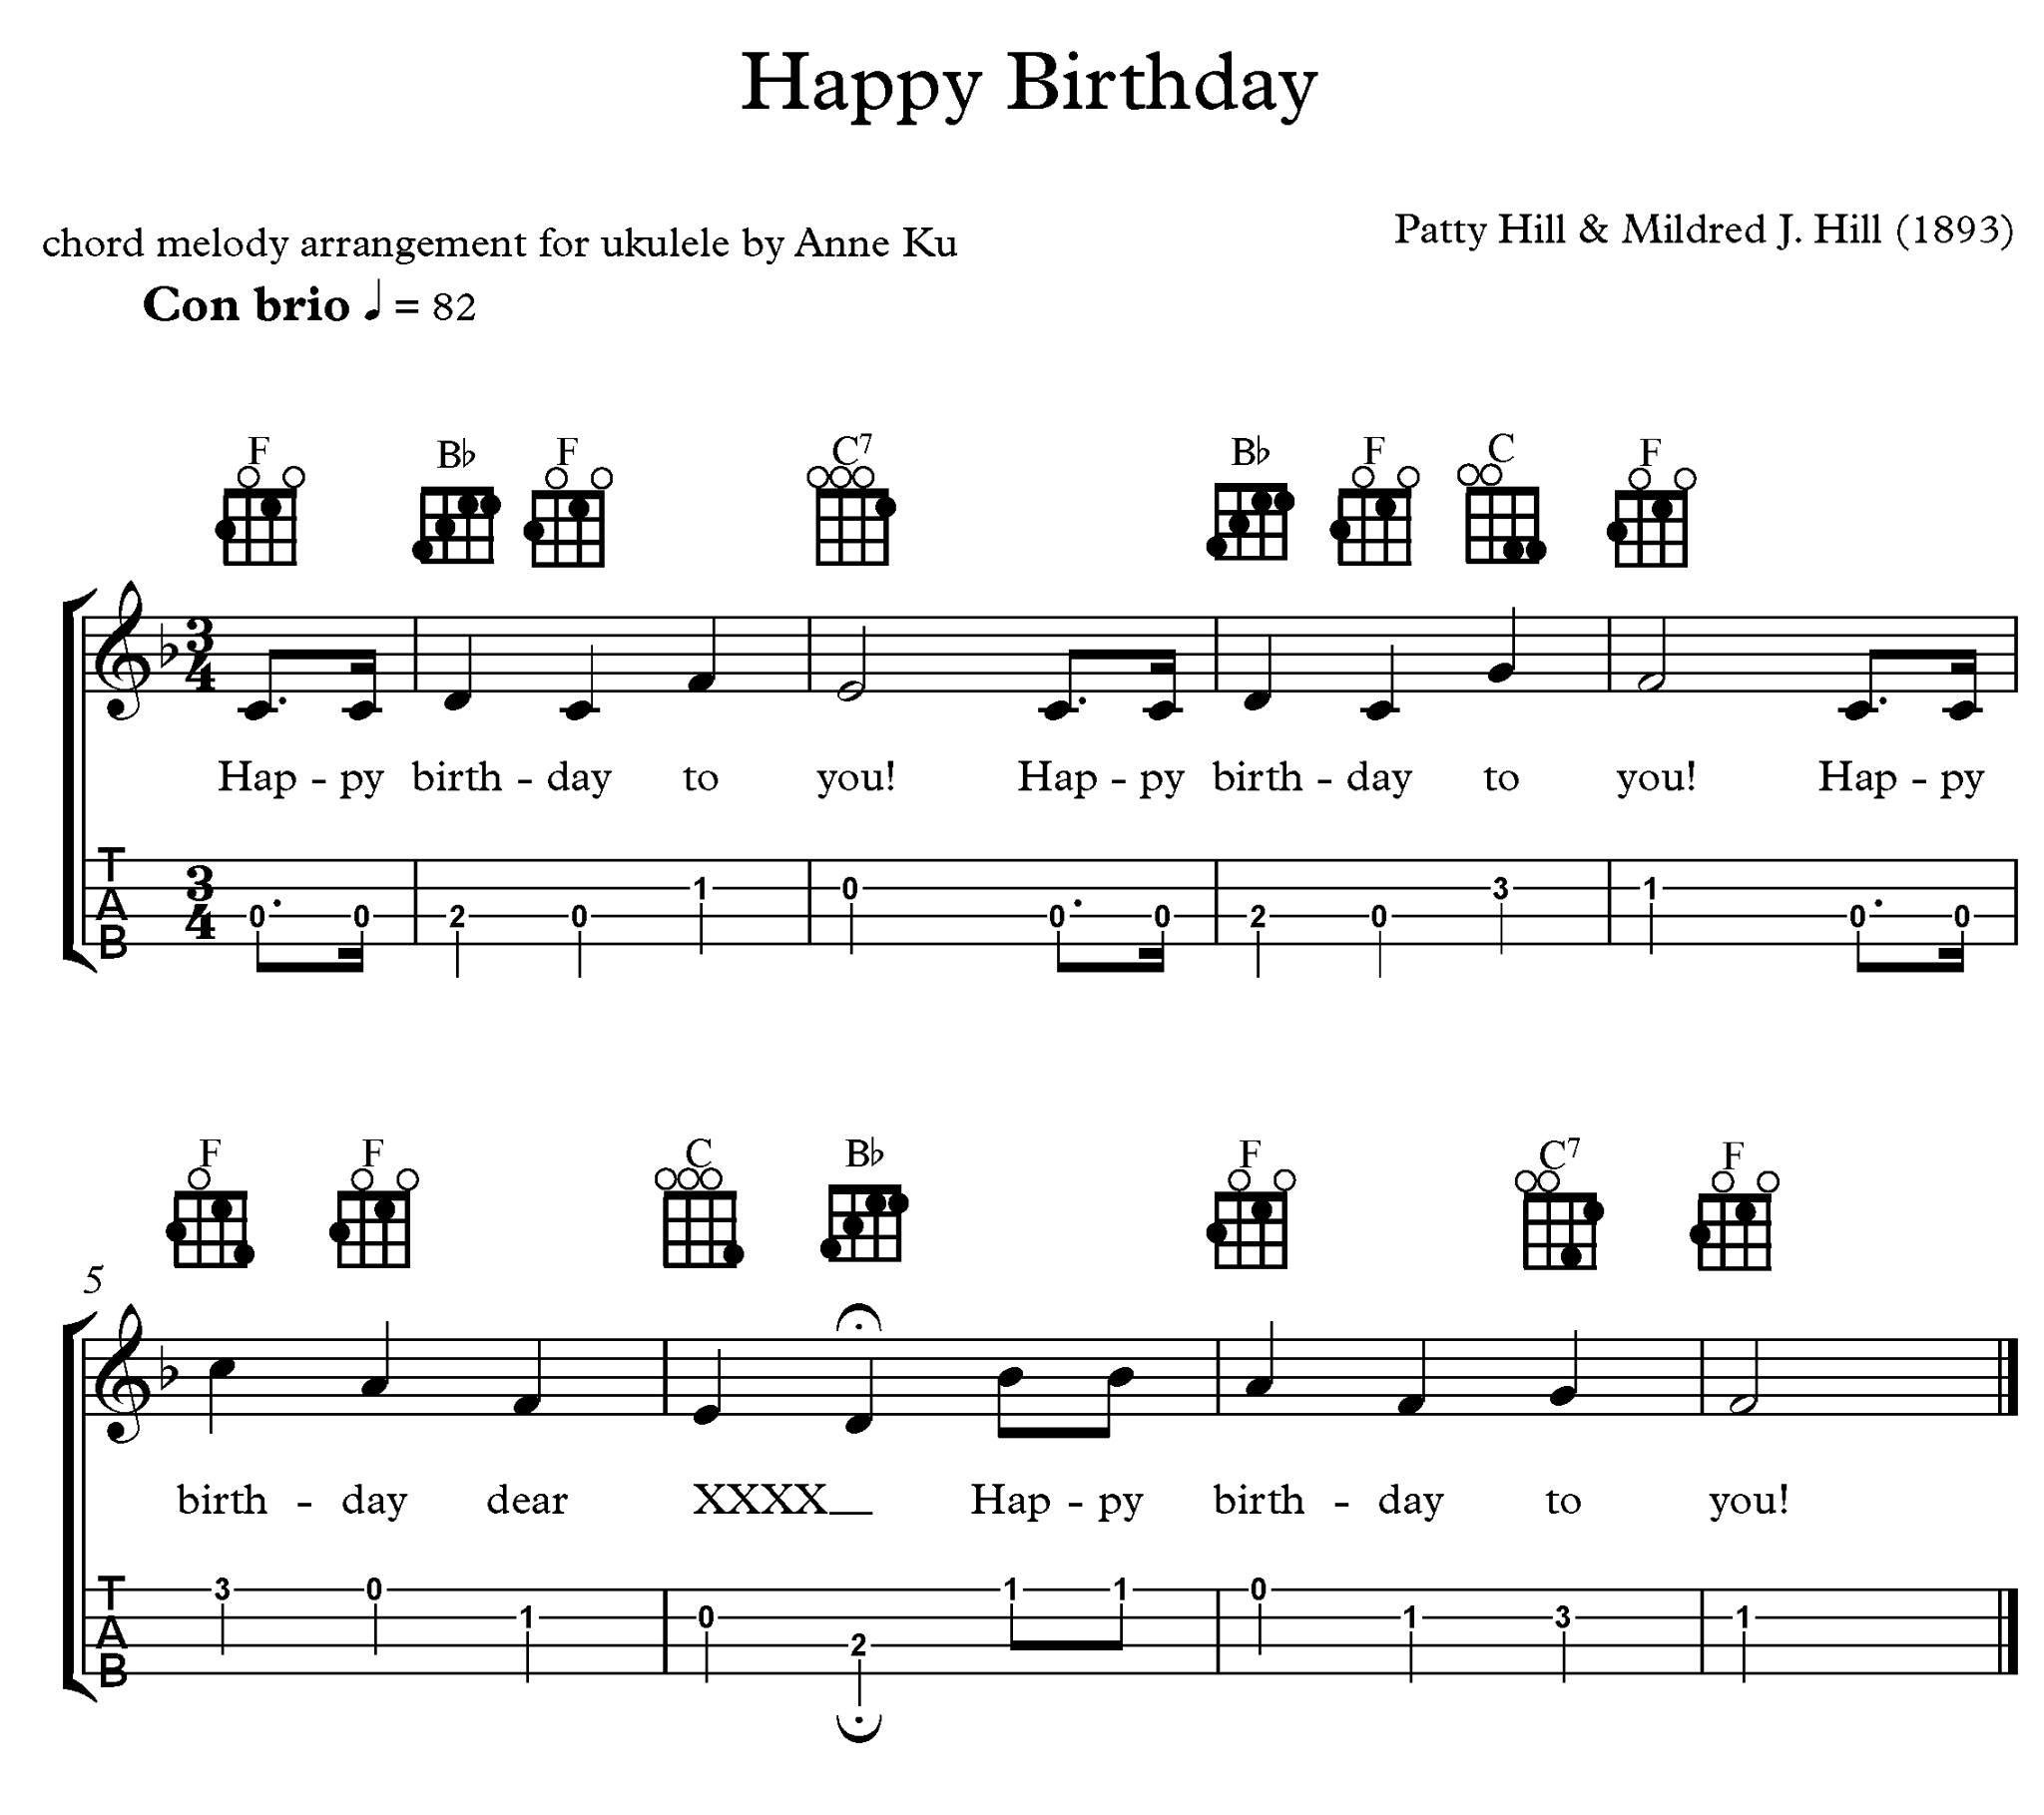 Happy Birthday chord melody arrangement for ukulele –Anne KuAnne Ku